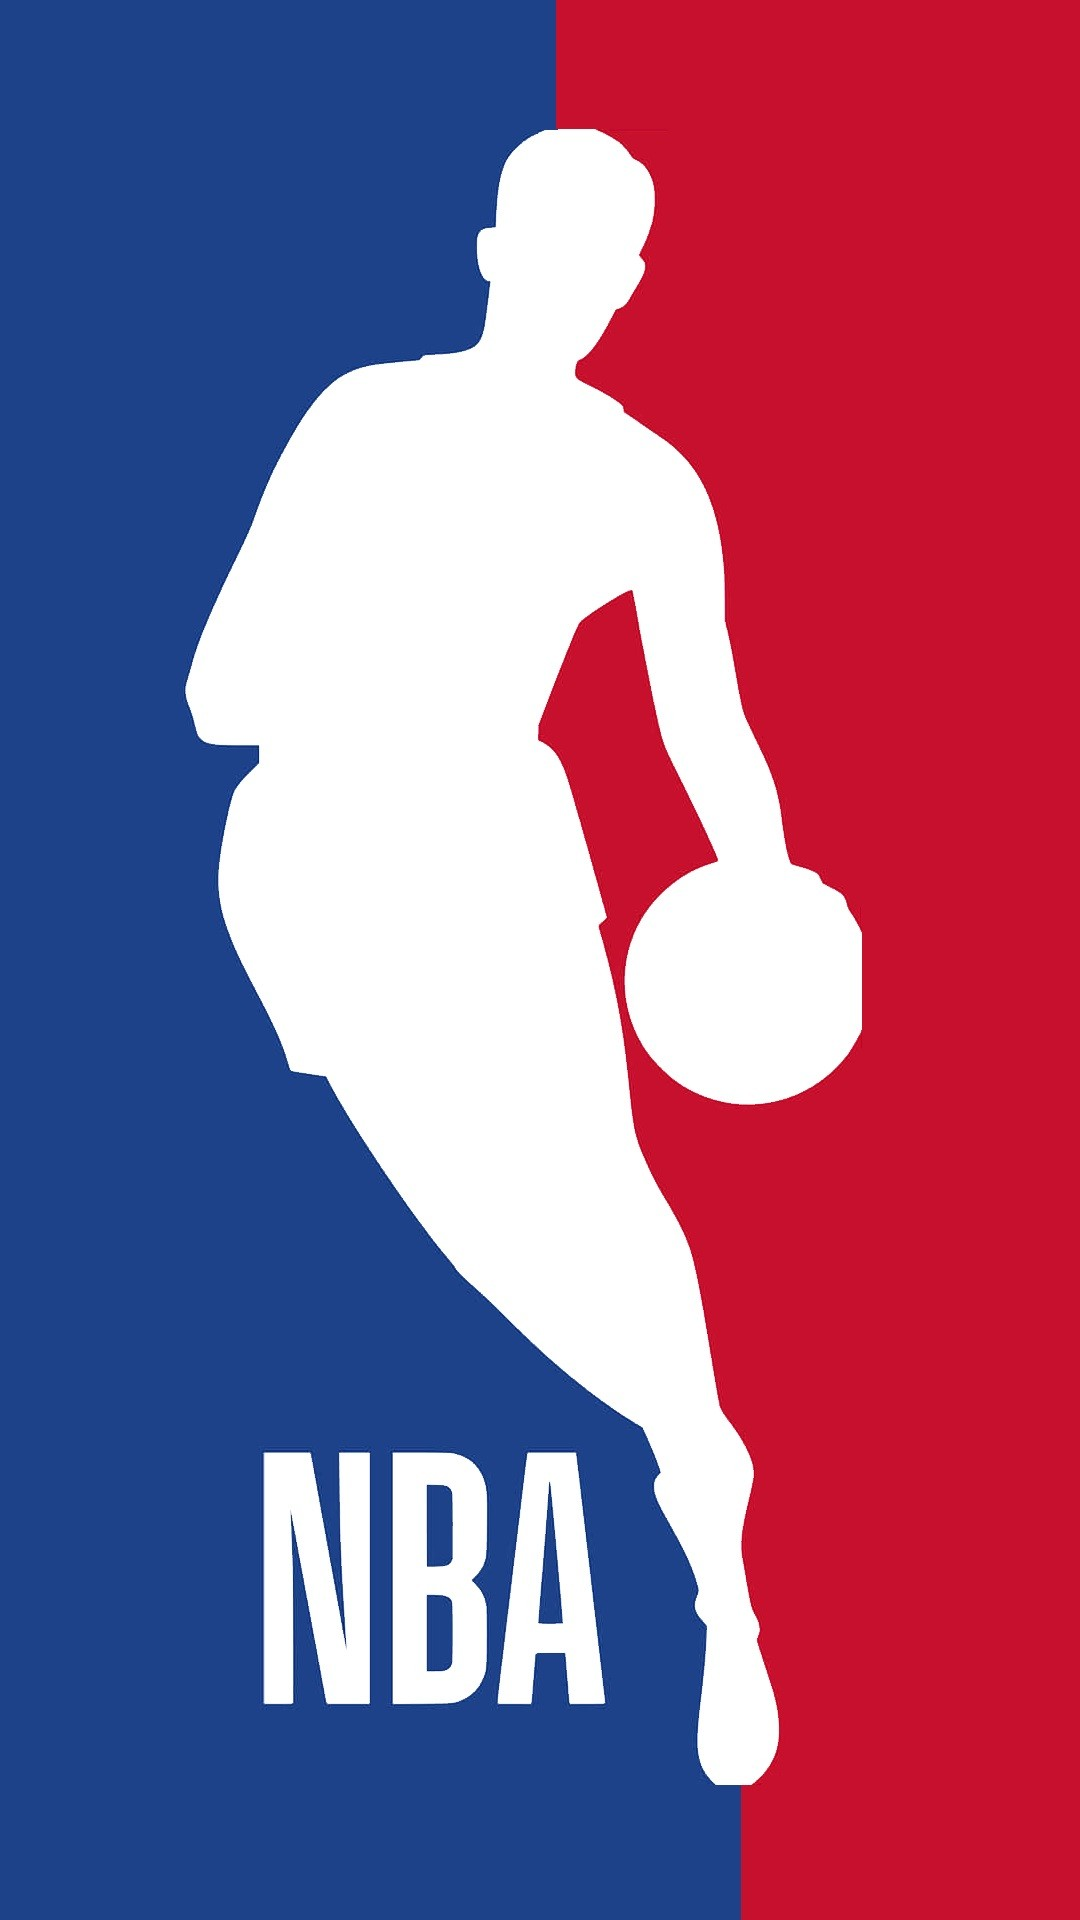 NBA iPhone Wallpaper   2020 NBA iPhone Wallpaper 1080x1920